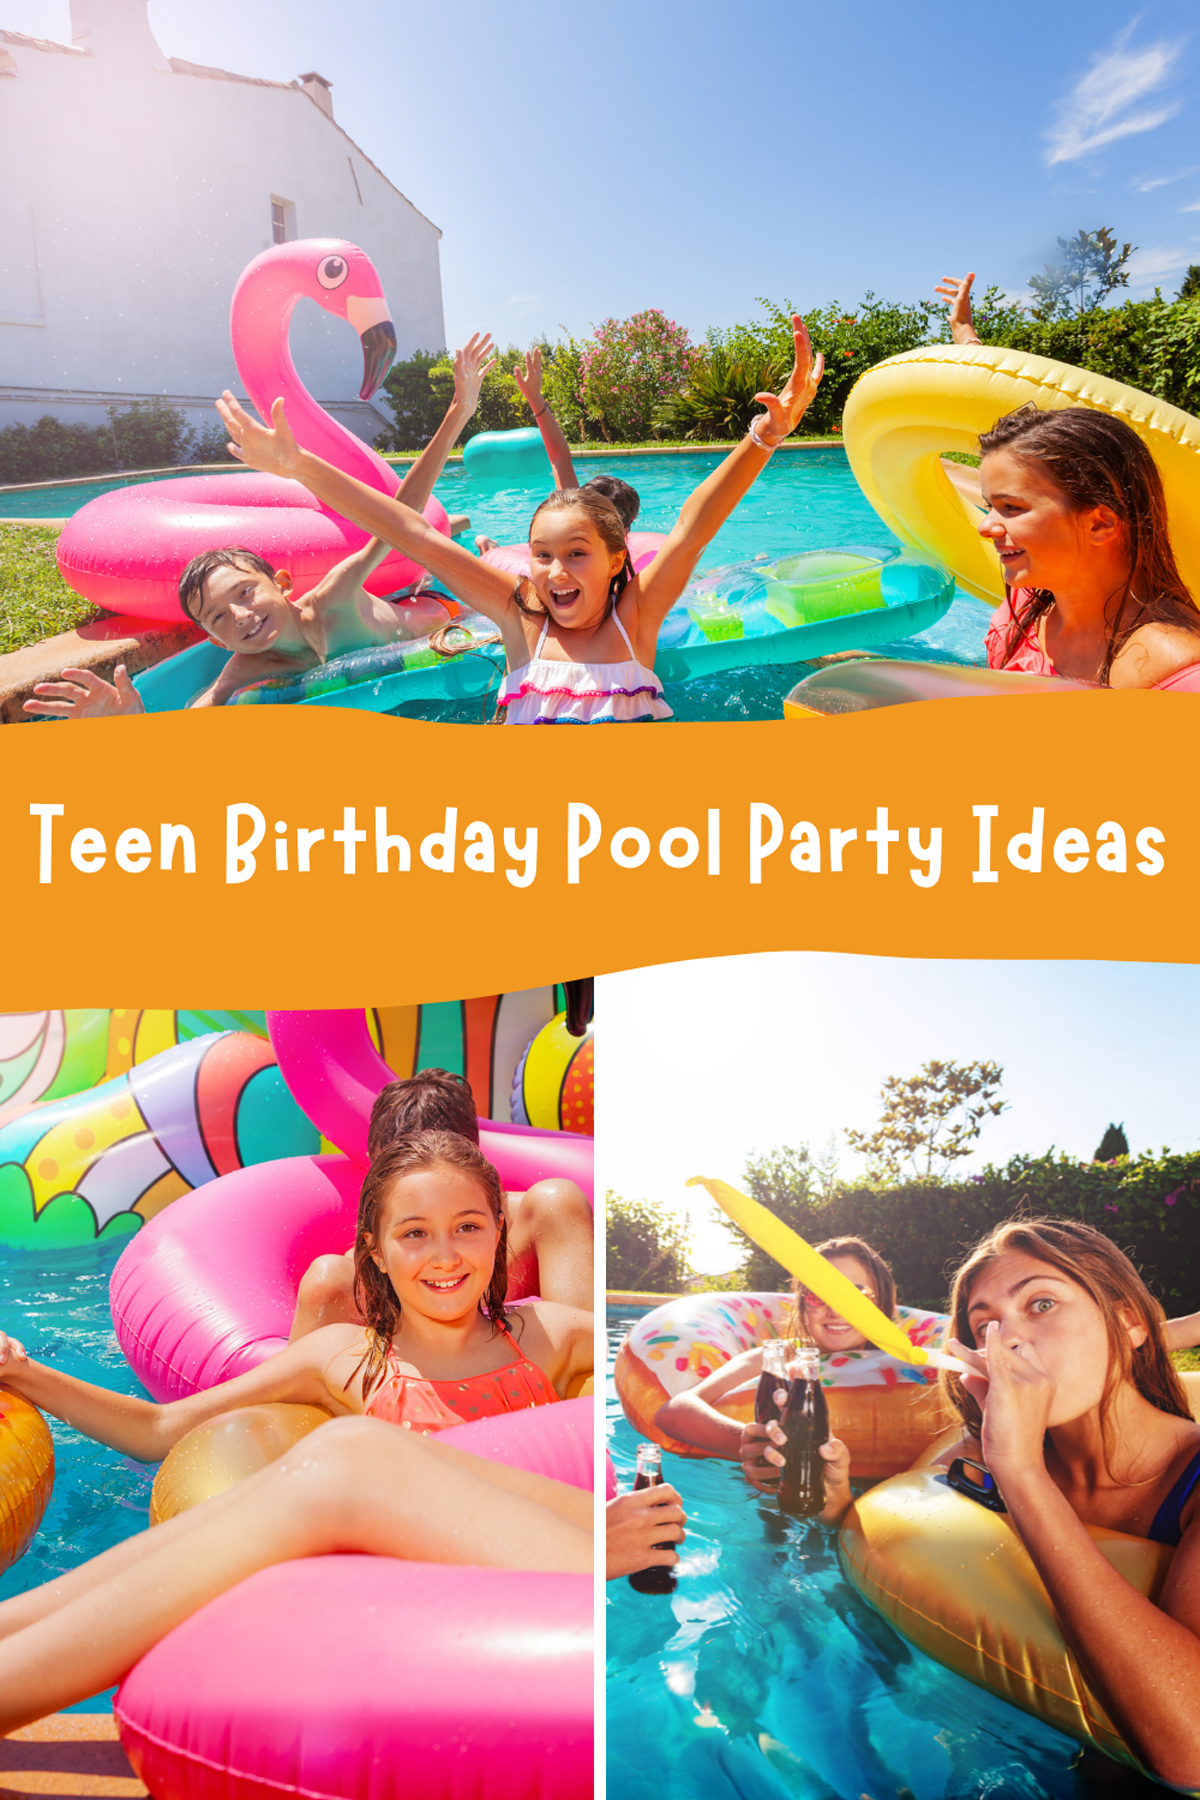 Teen Birthday Pool Party Ideas